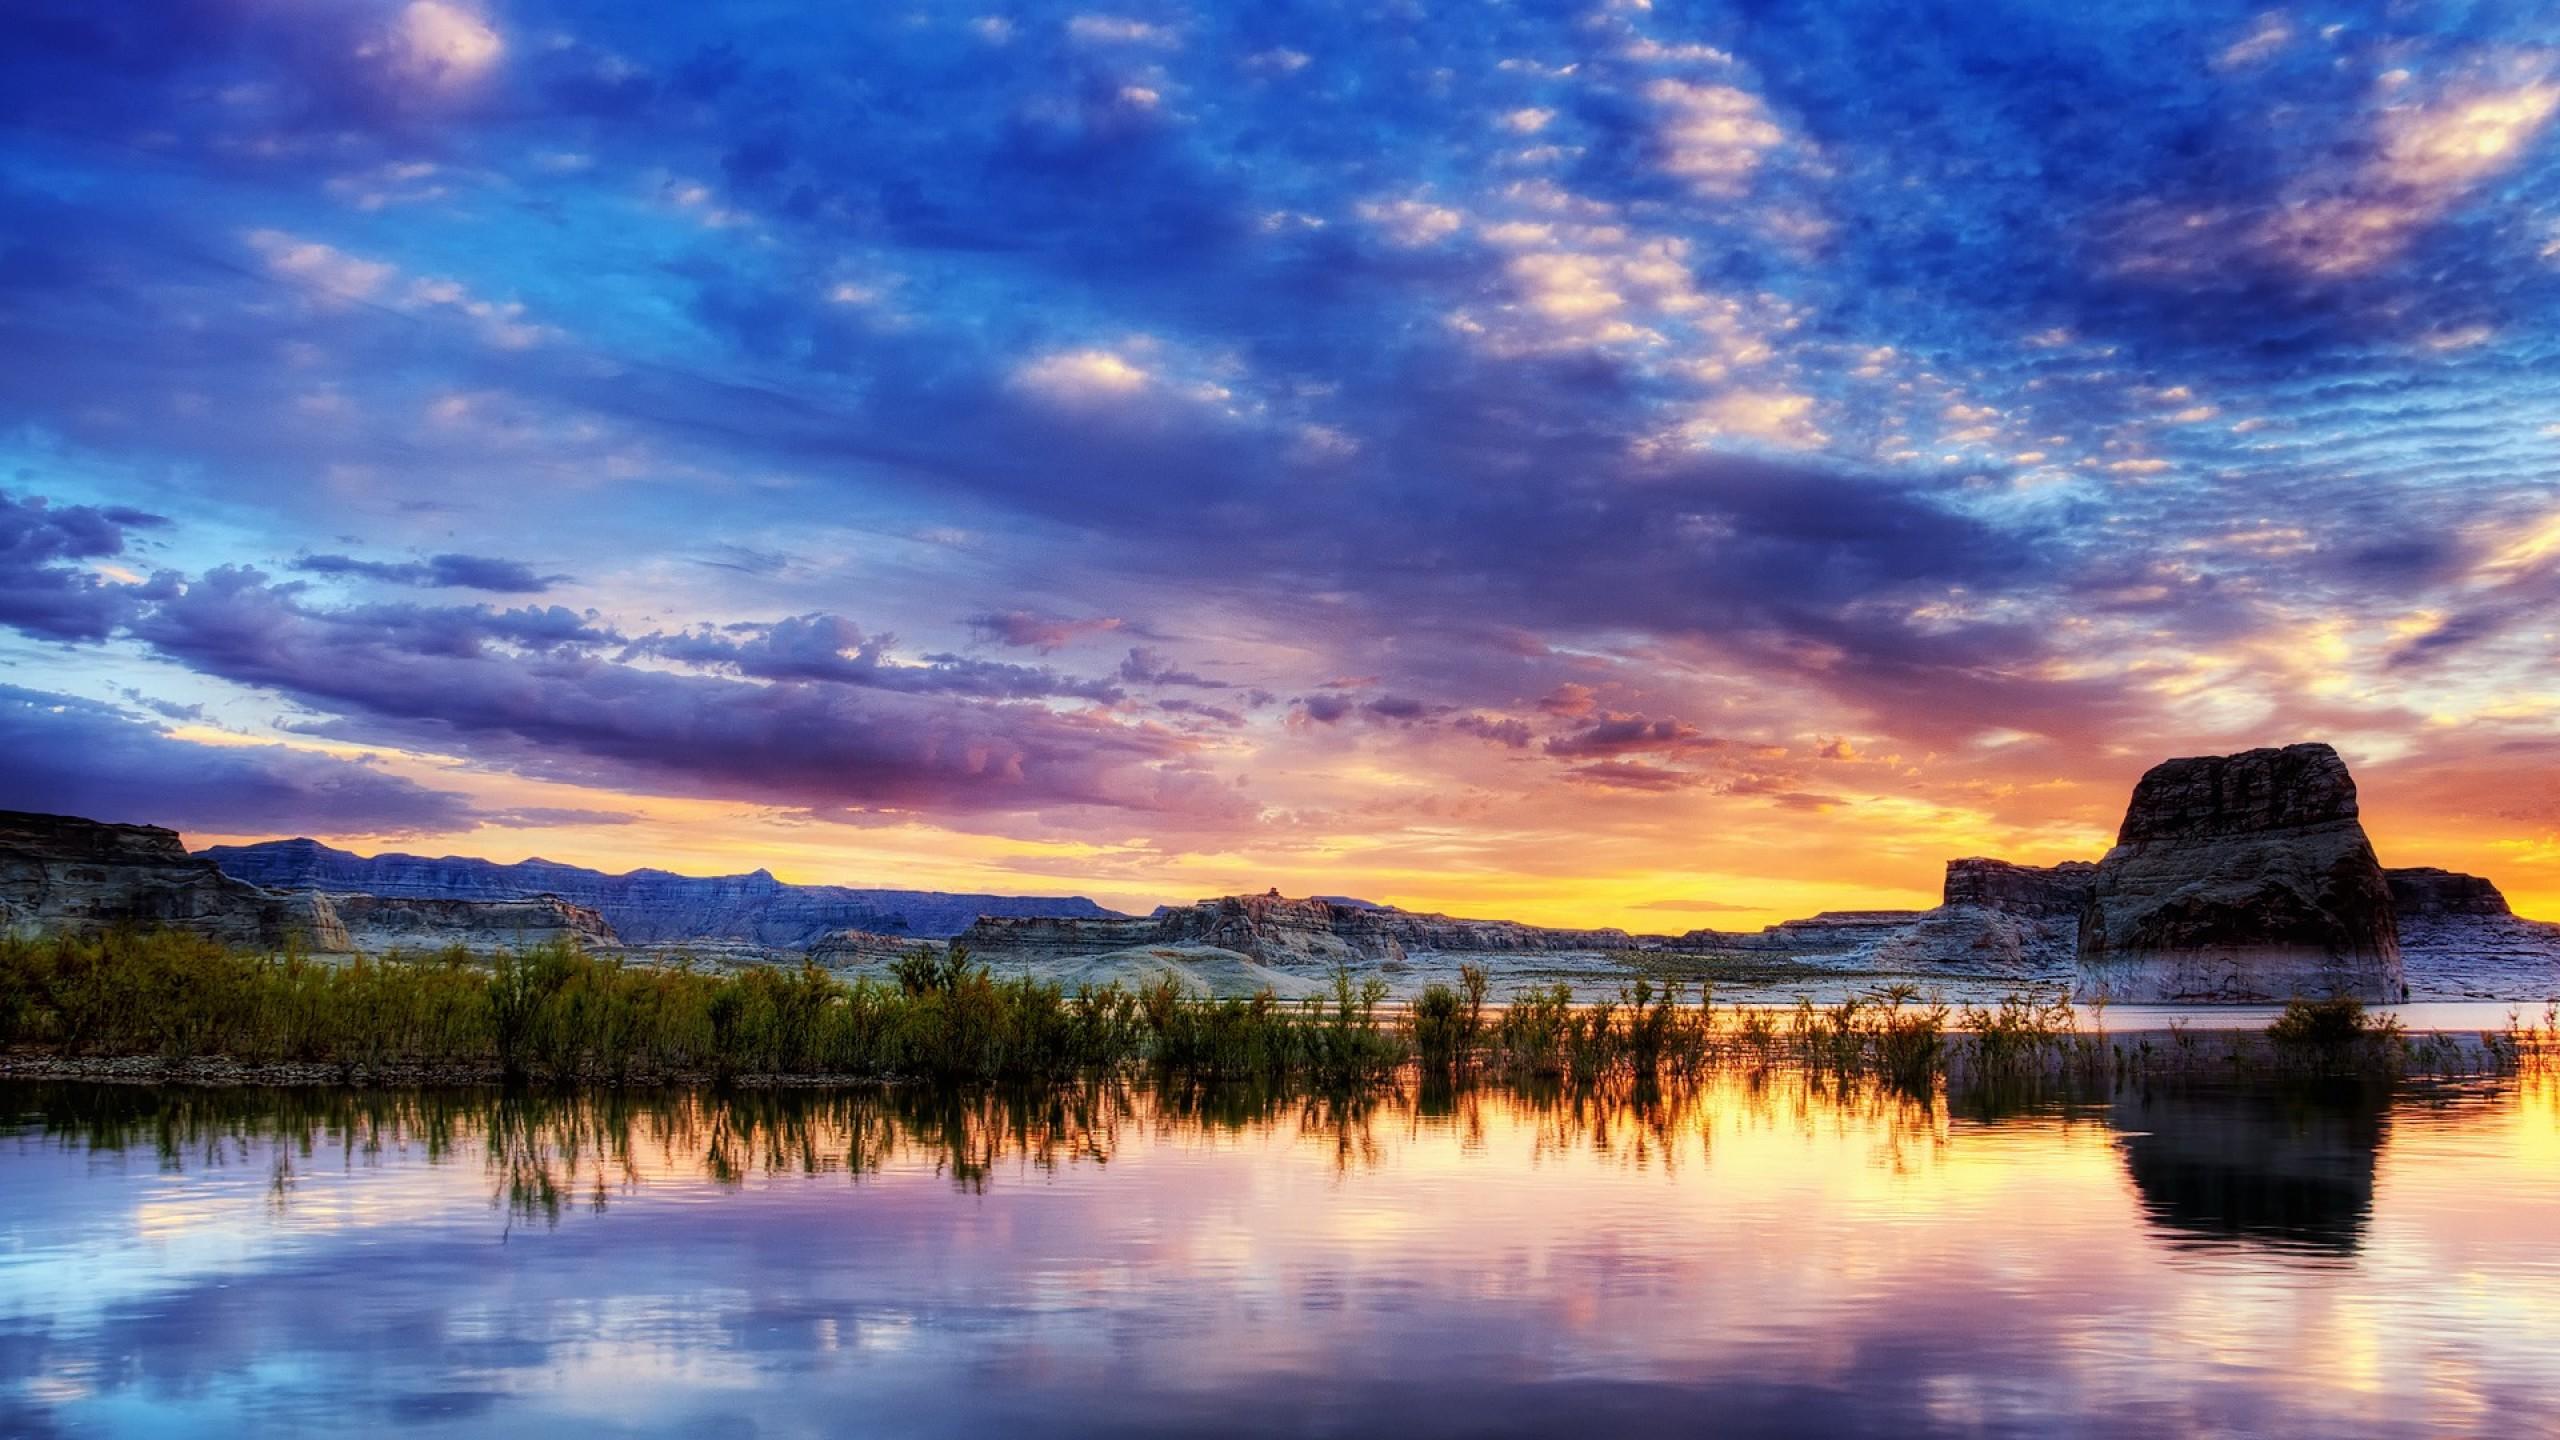 Desktop Wallpaper Arizona wallpaper   1036803 2560x1440